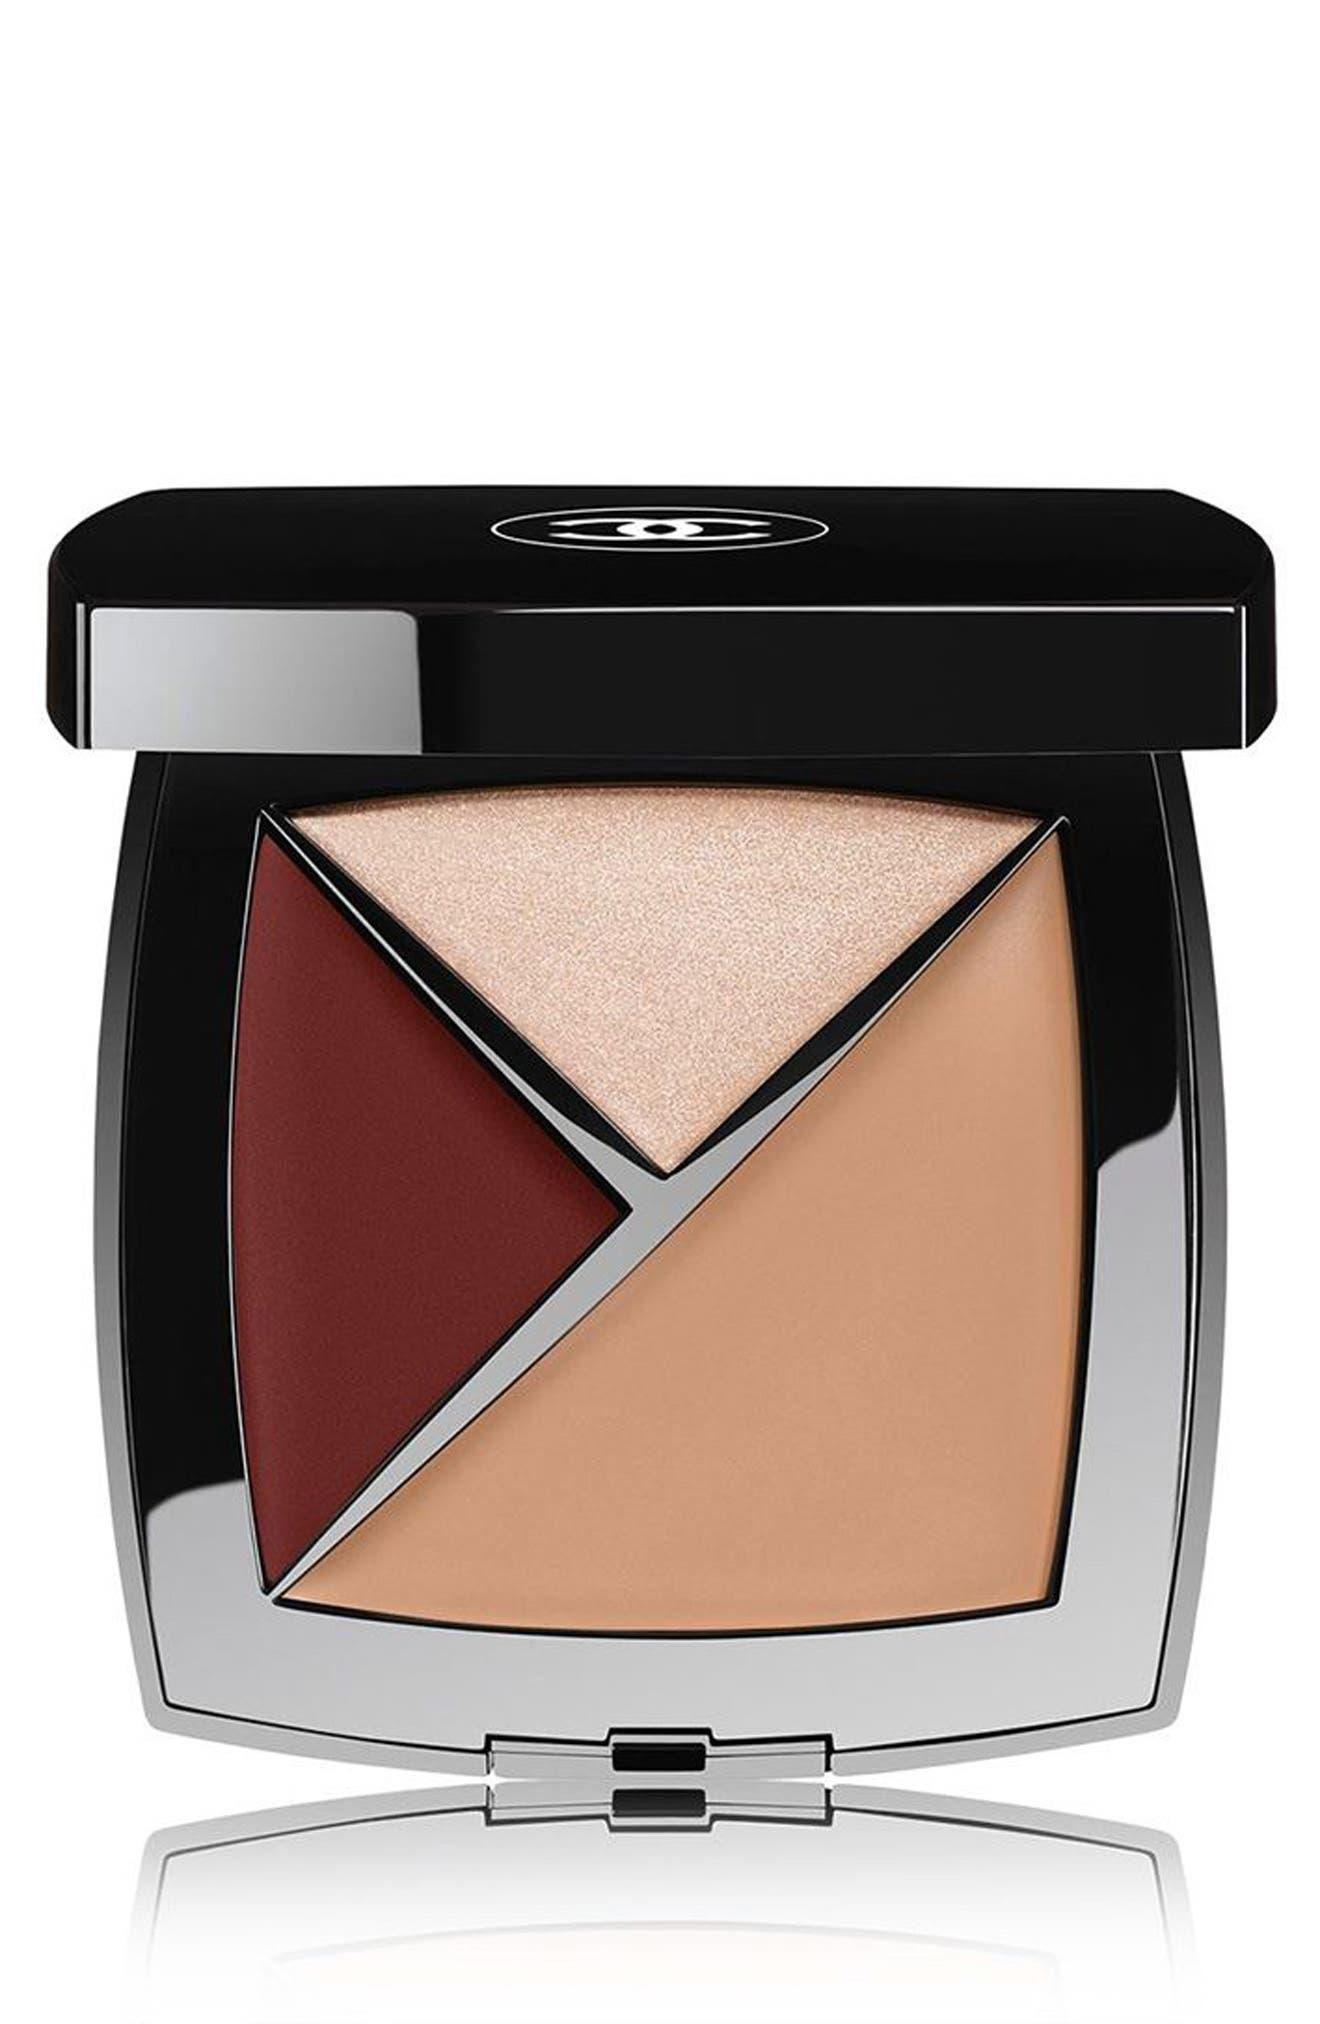 Main Image - CHANEL PALETTE ESSENTIELLE Conceal & Highlight Palette